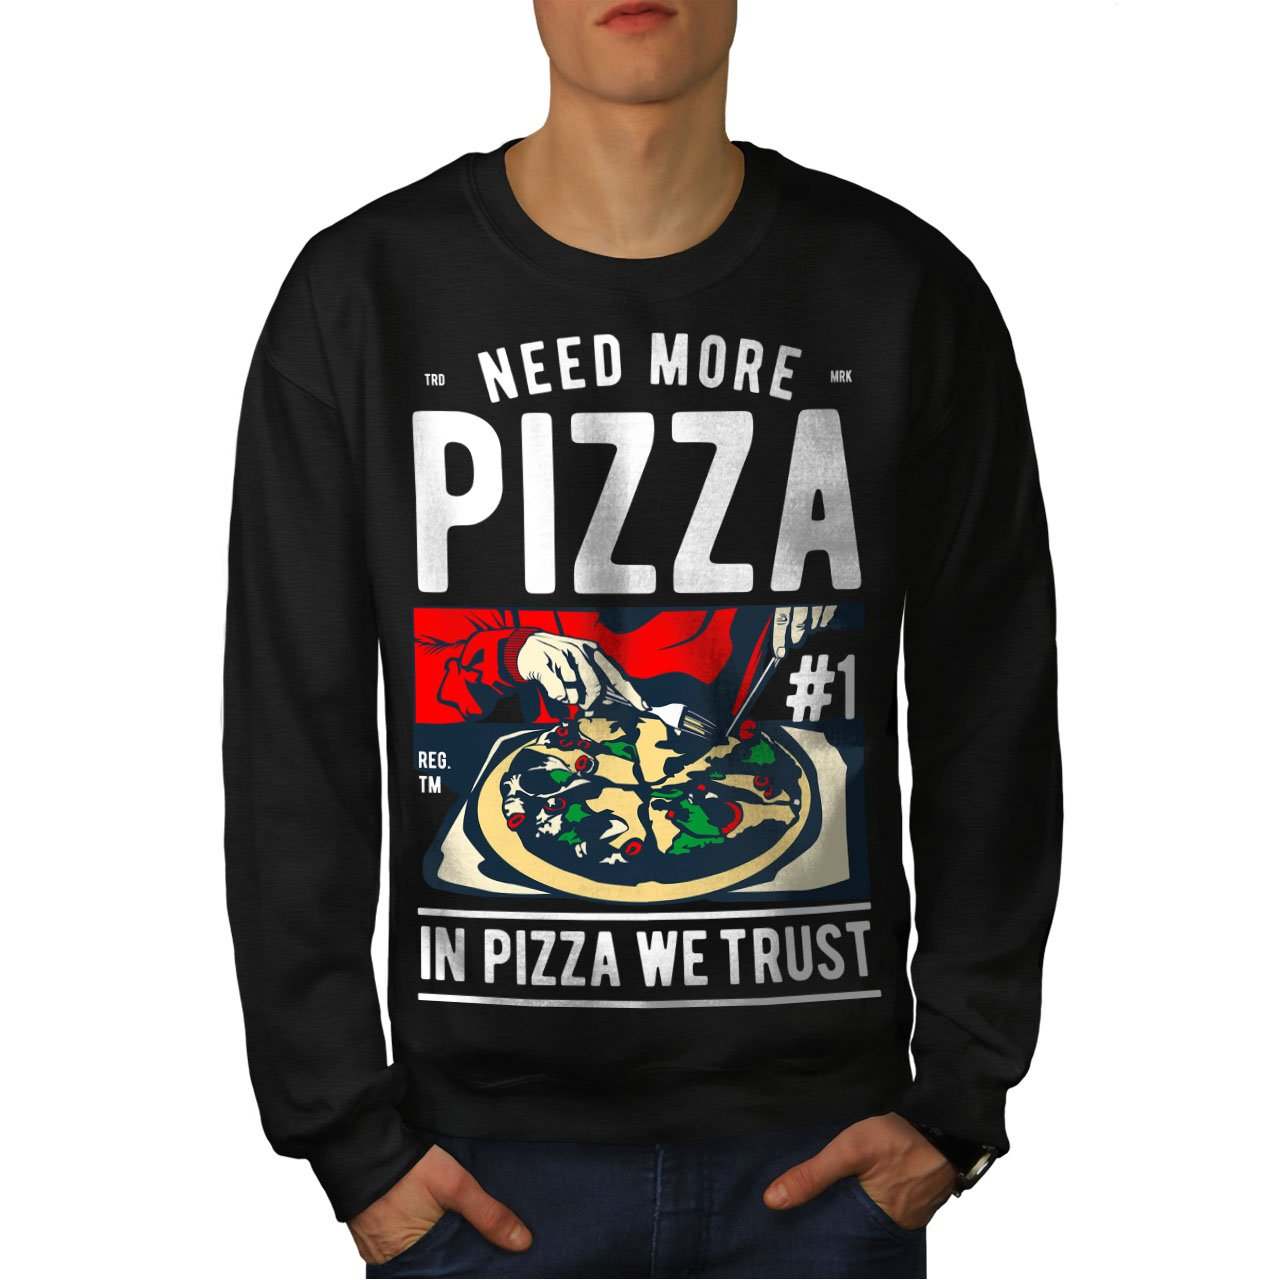 Italian Casual Jumper wellcoda in Pizza We Trust Mens Sweatshirt